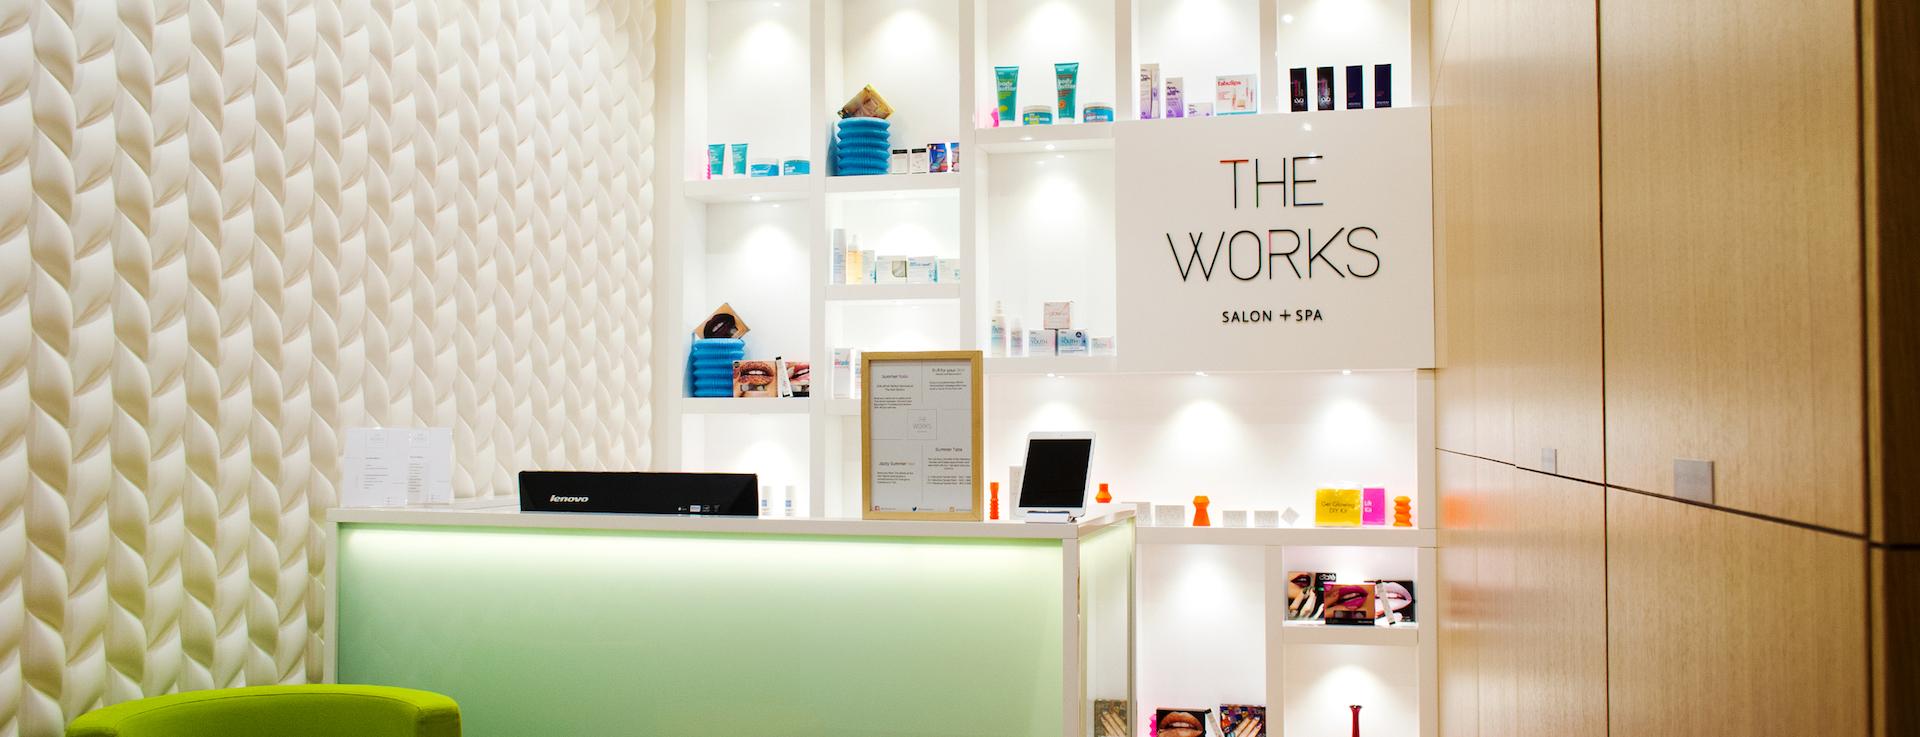 The Works Salon + Spa Dubai Media City